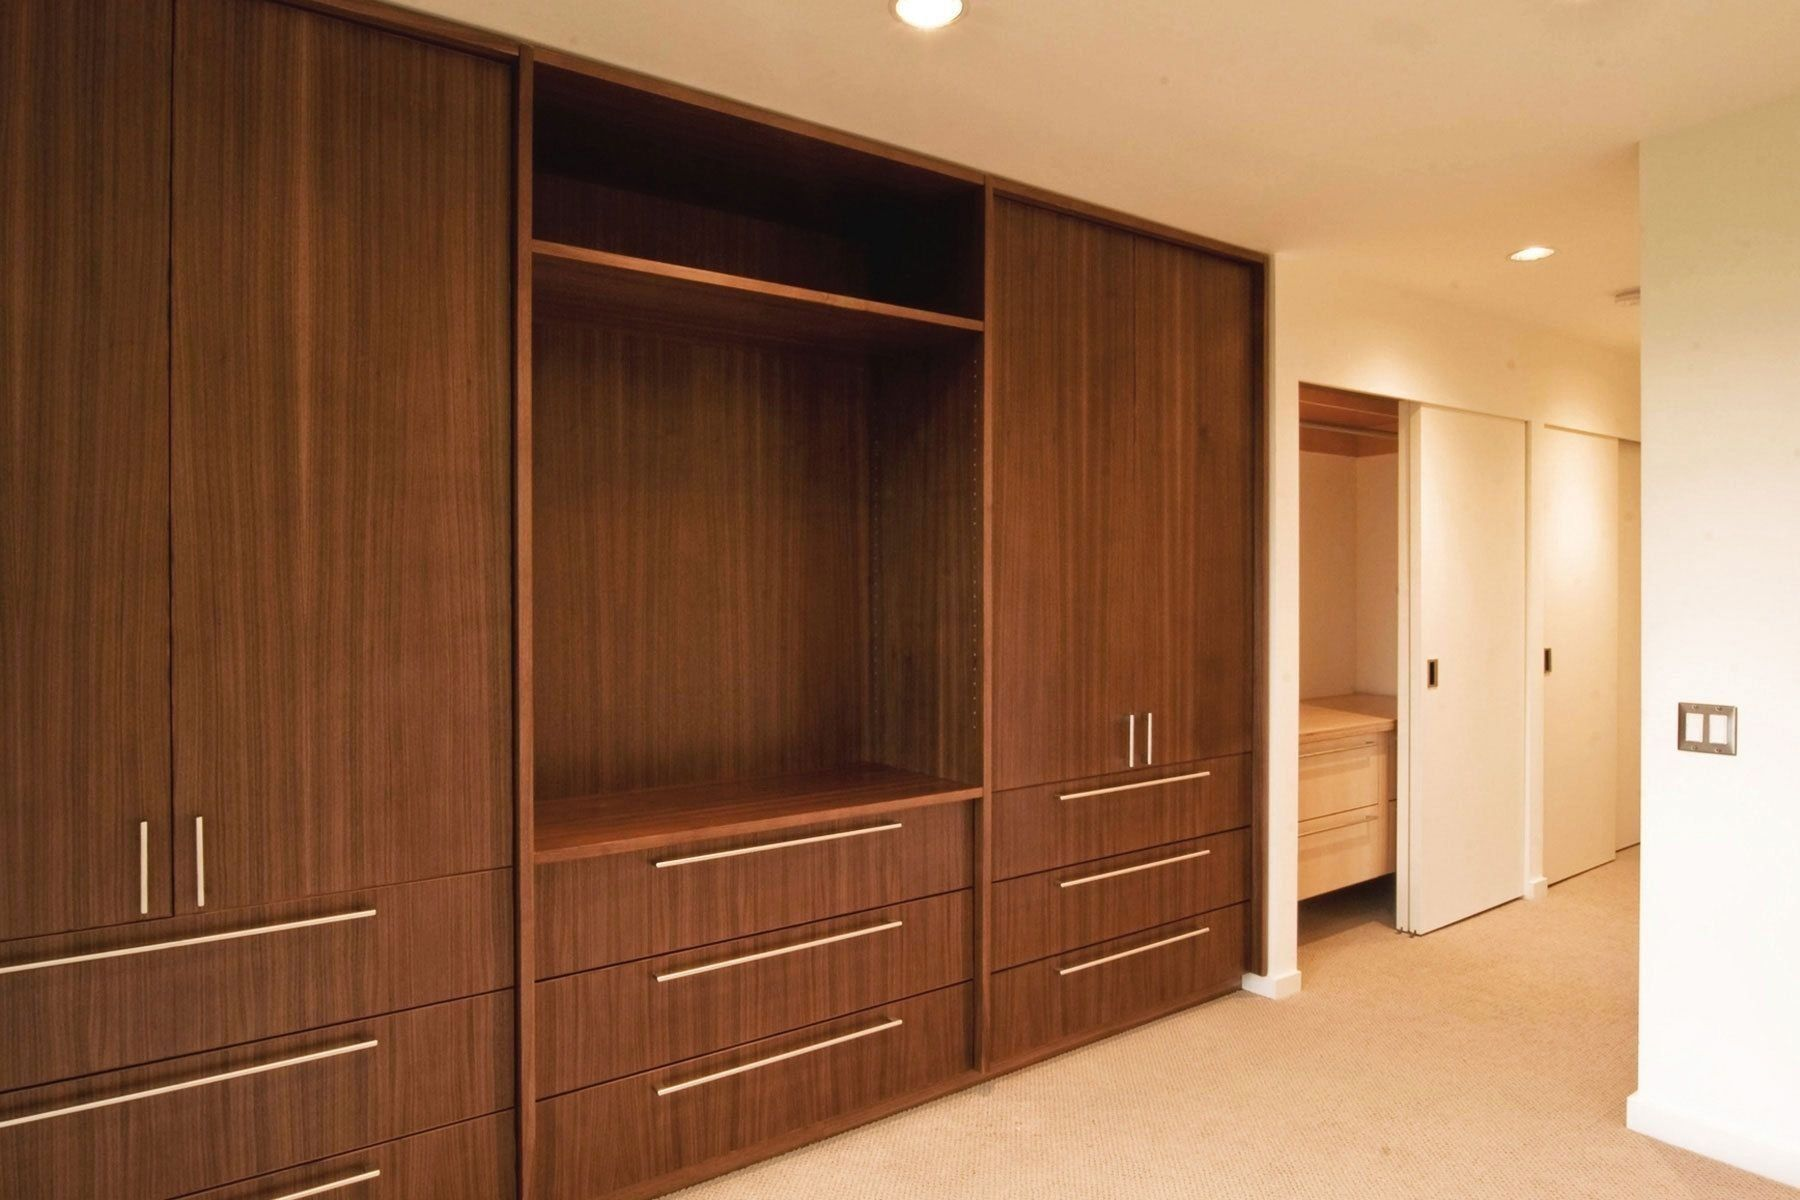 Wonderfull Wooden Wall Almirah Fullwallwoodenalmirah Woodenalmirahattachedwit In 2020 Cupboard Design Bedroom Cupboard Designs Wardrobe Wall